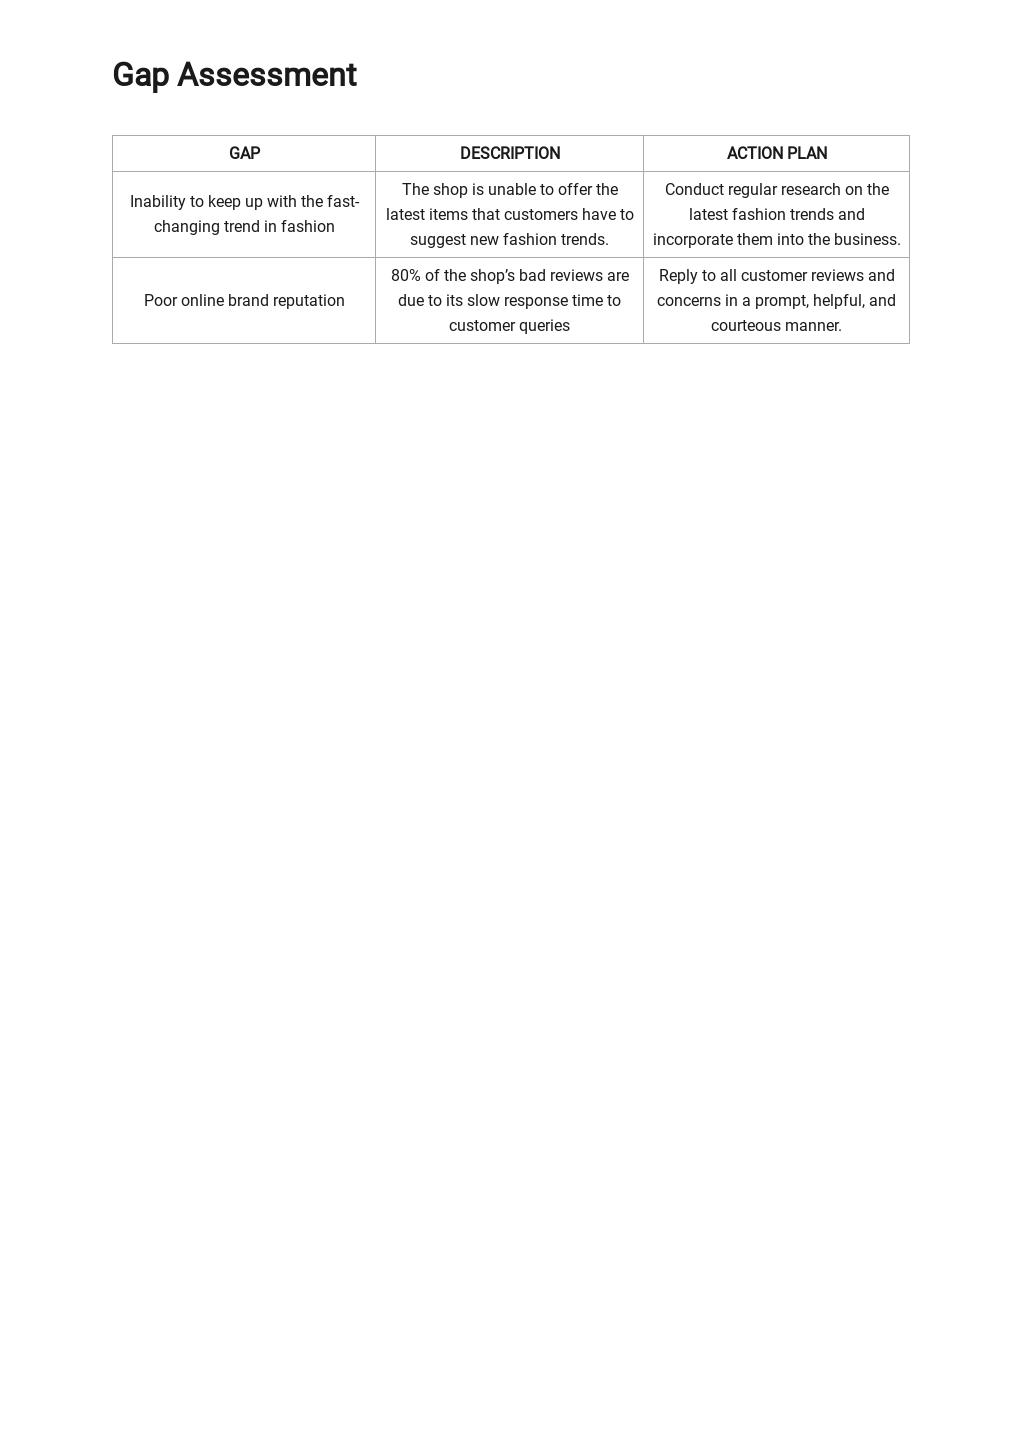 Capabilities Analysis Template 3.jpe